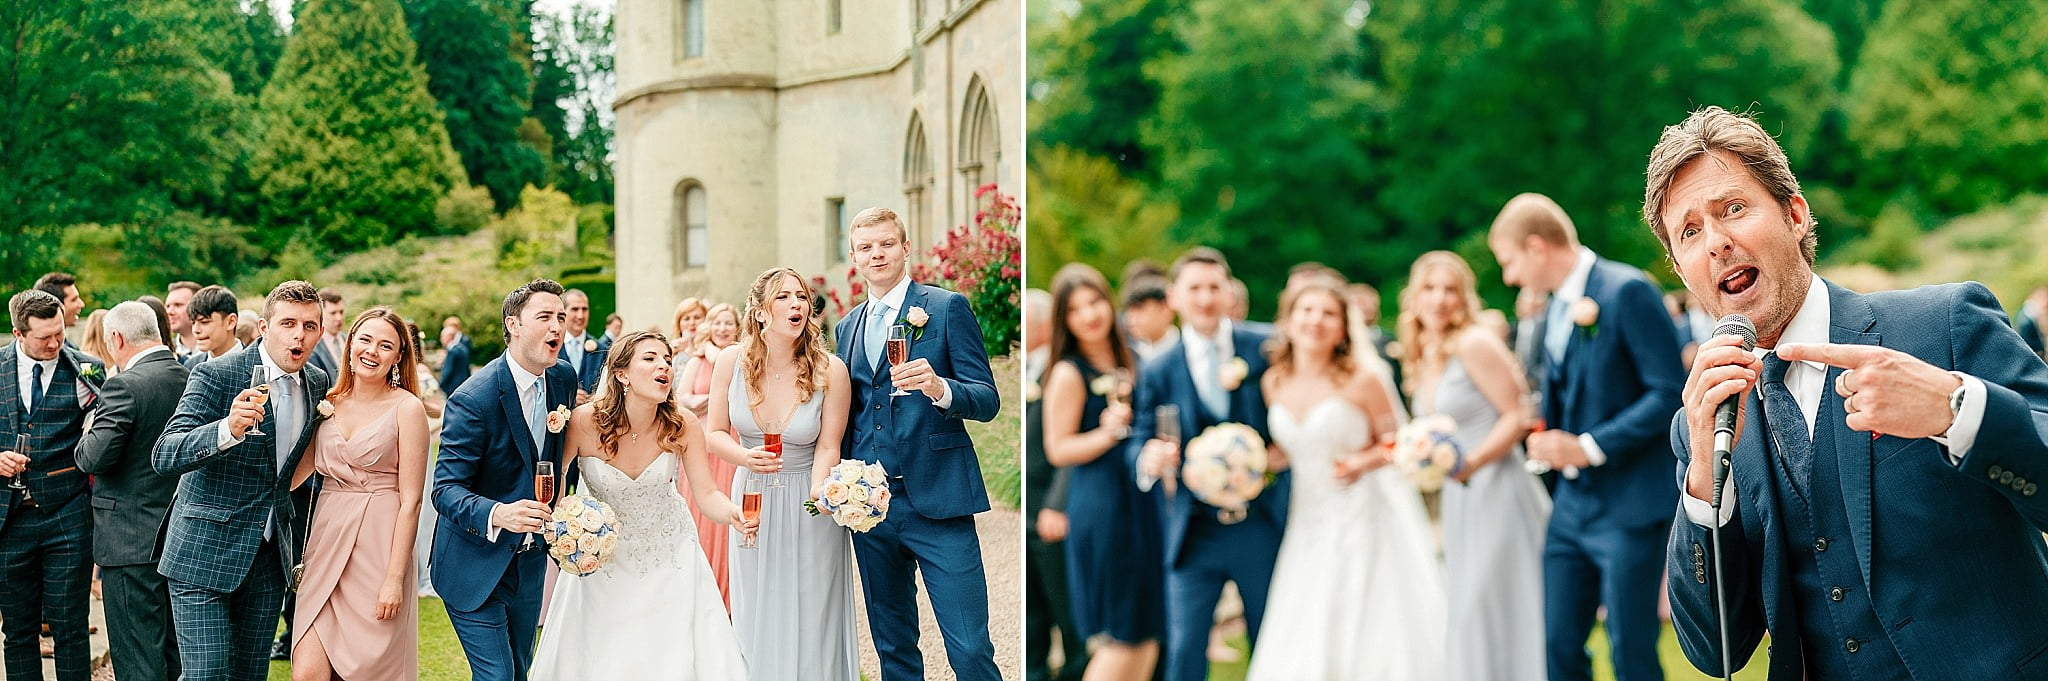 Eastnor Castle Wedding - Ilona + Shane 42